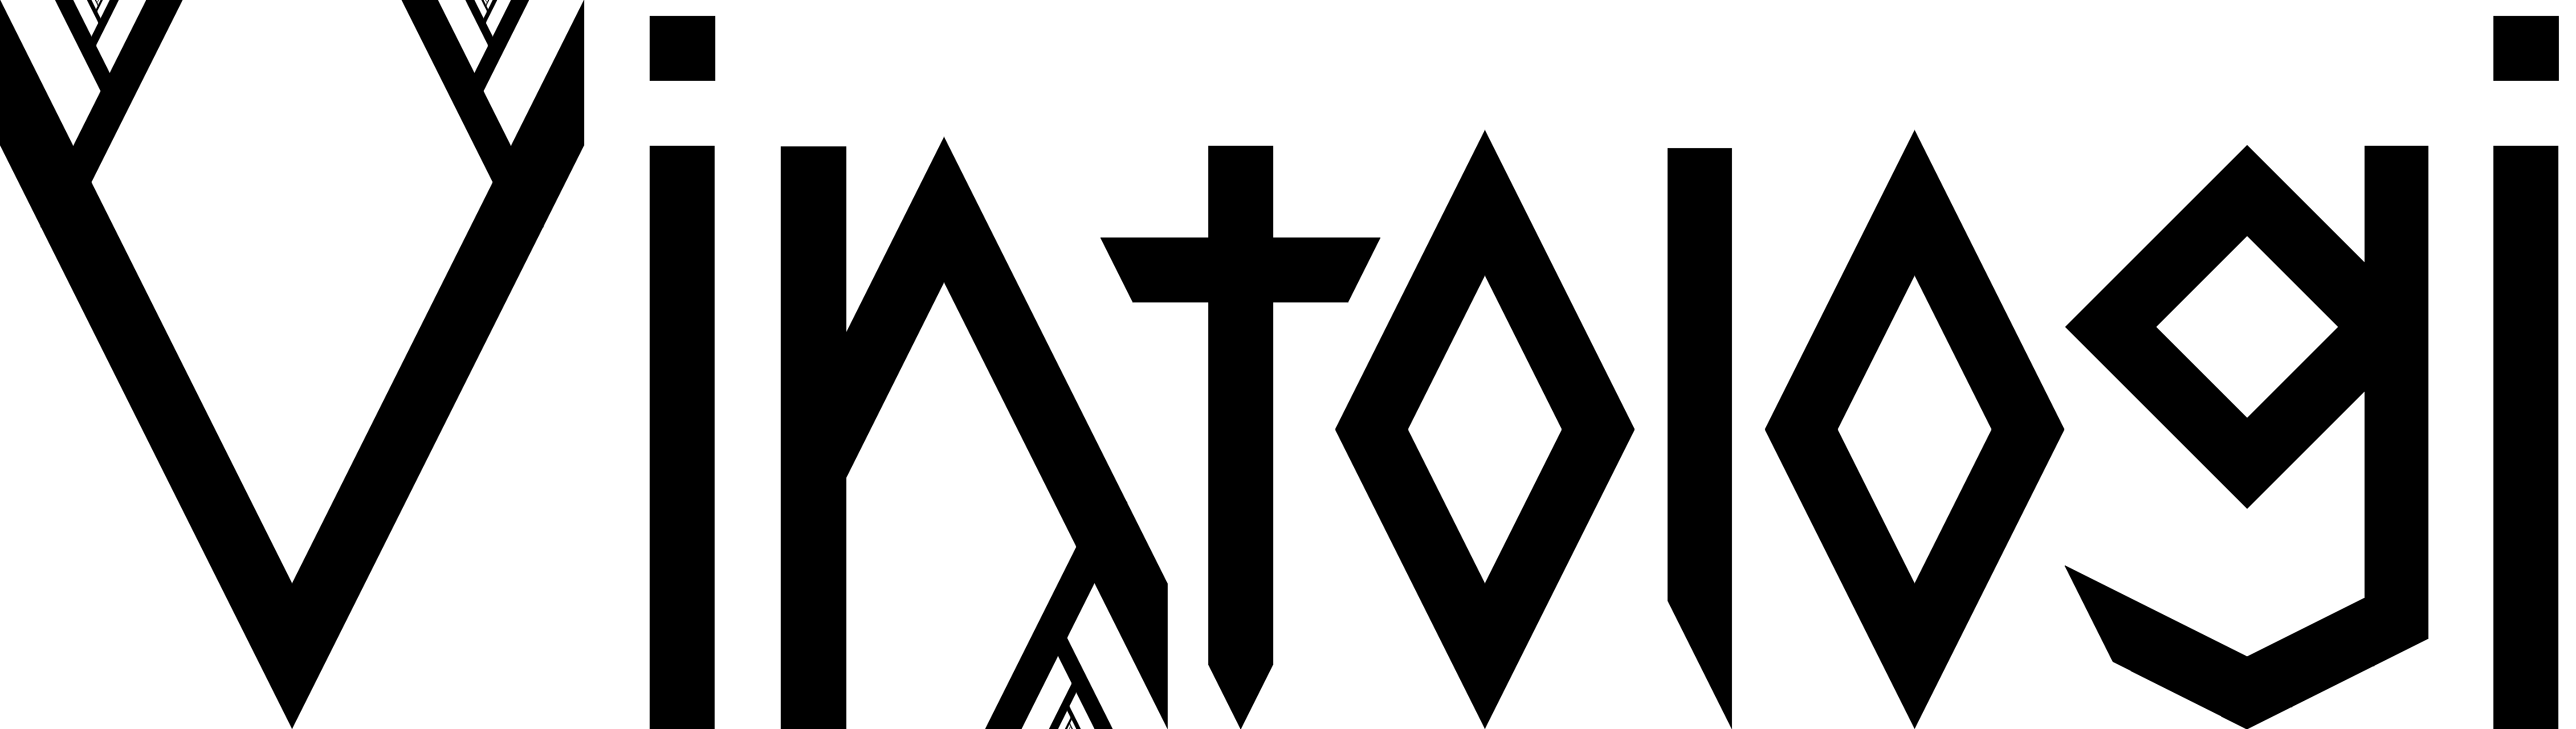 vintologi-logo18.png